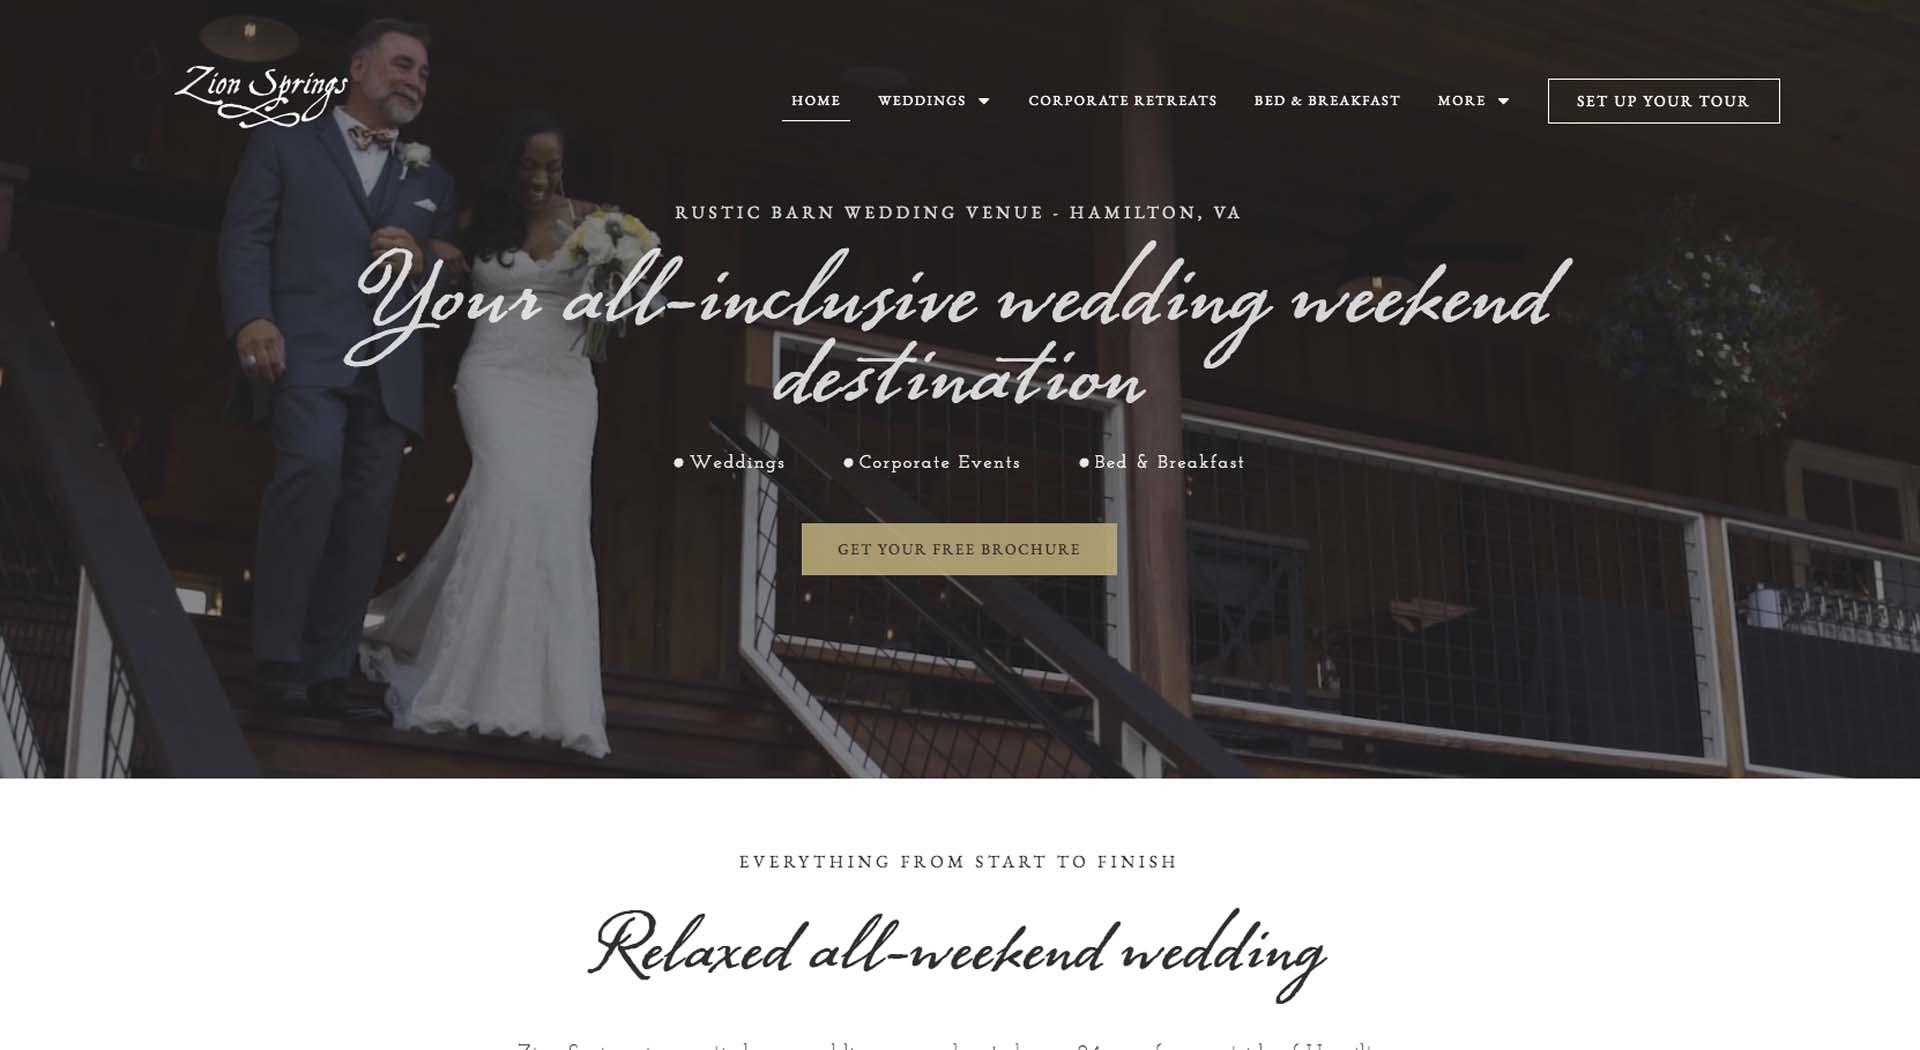 #1 SEO for Wedding Venues 6